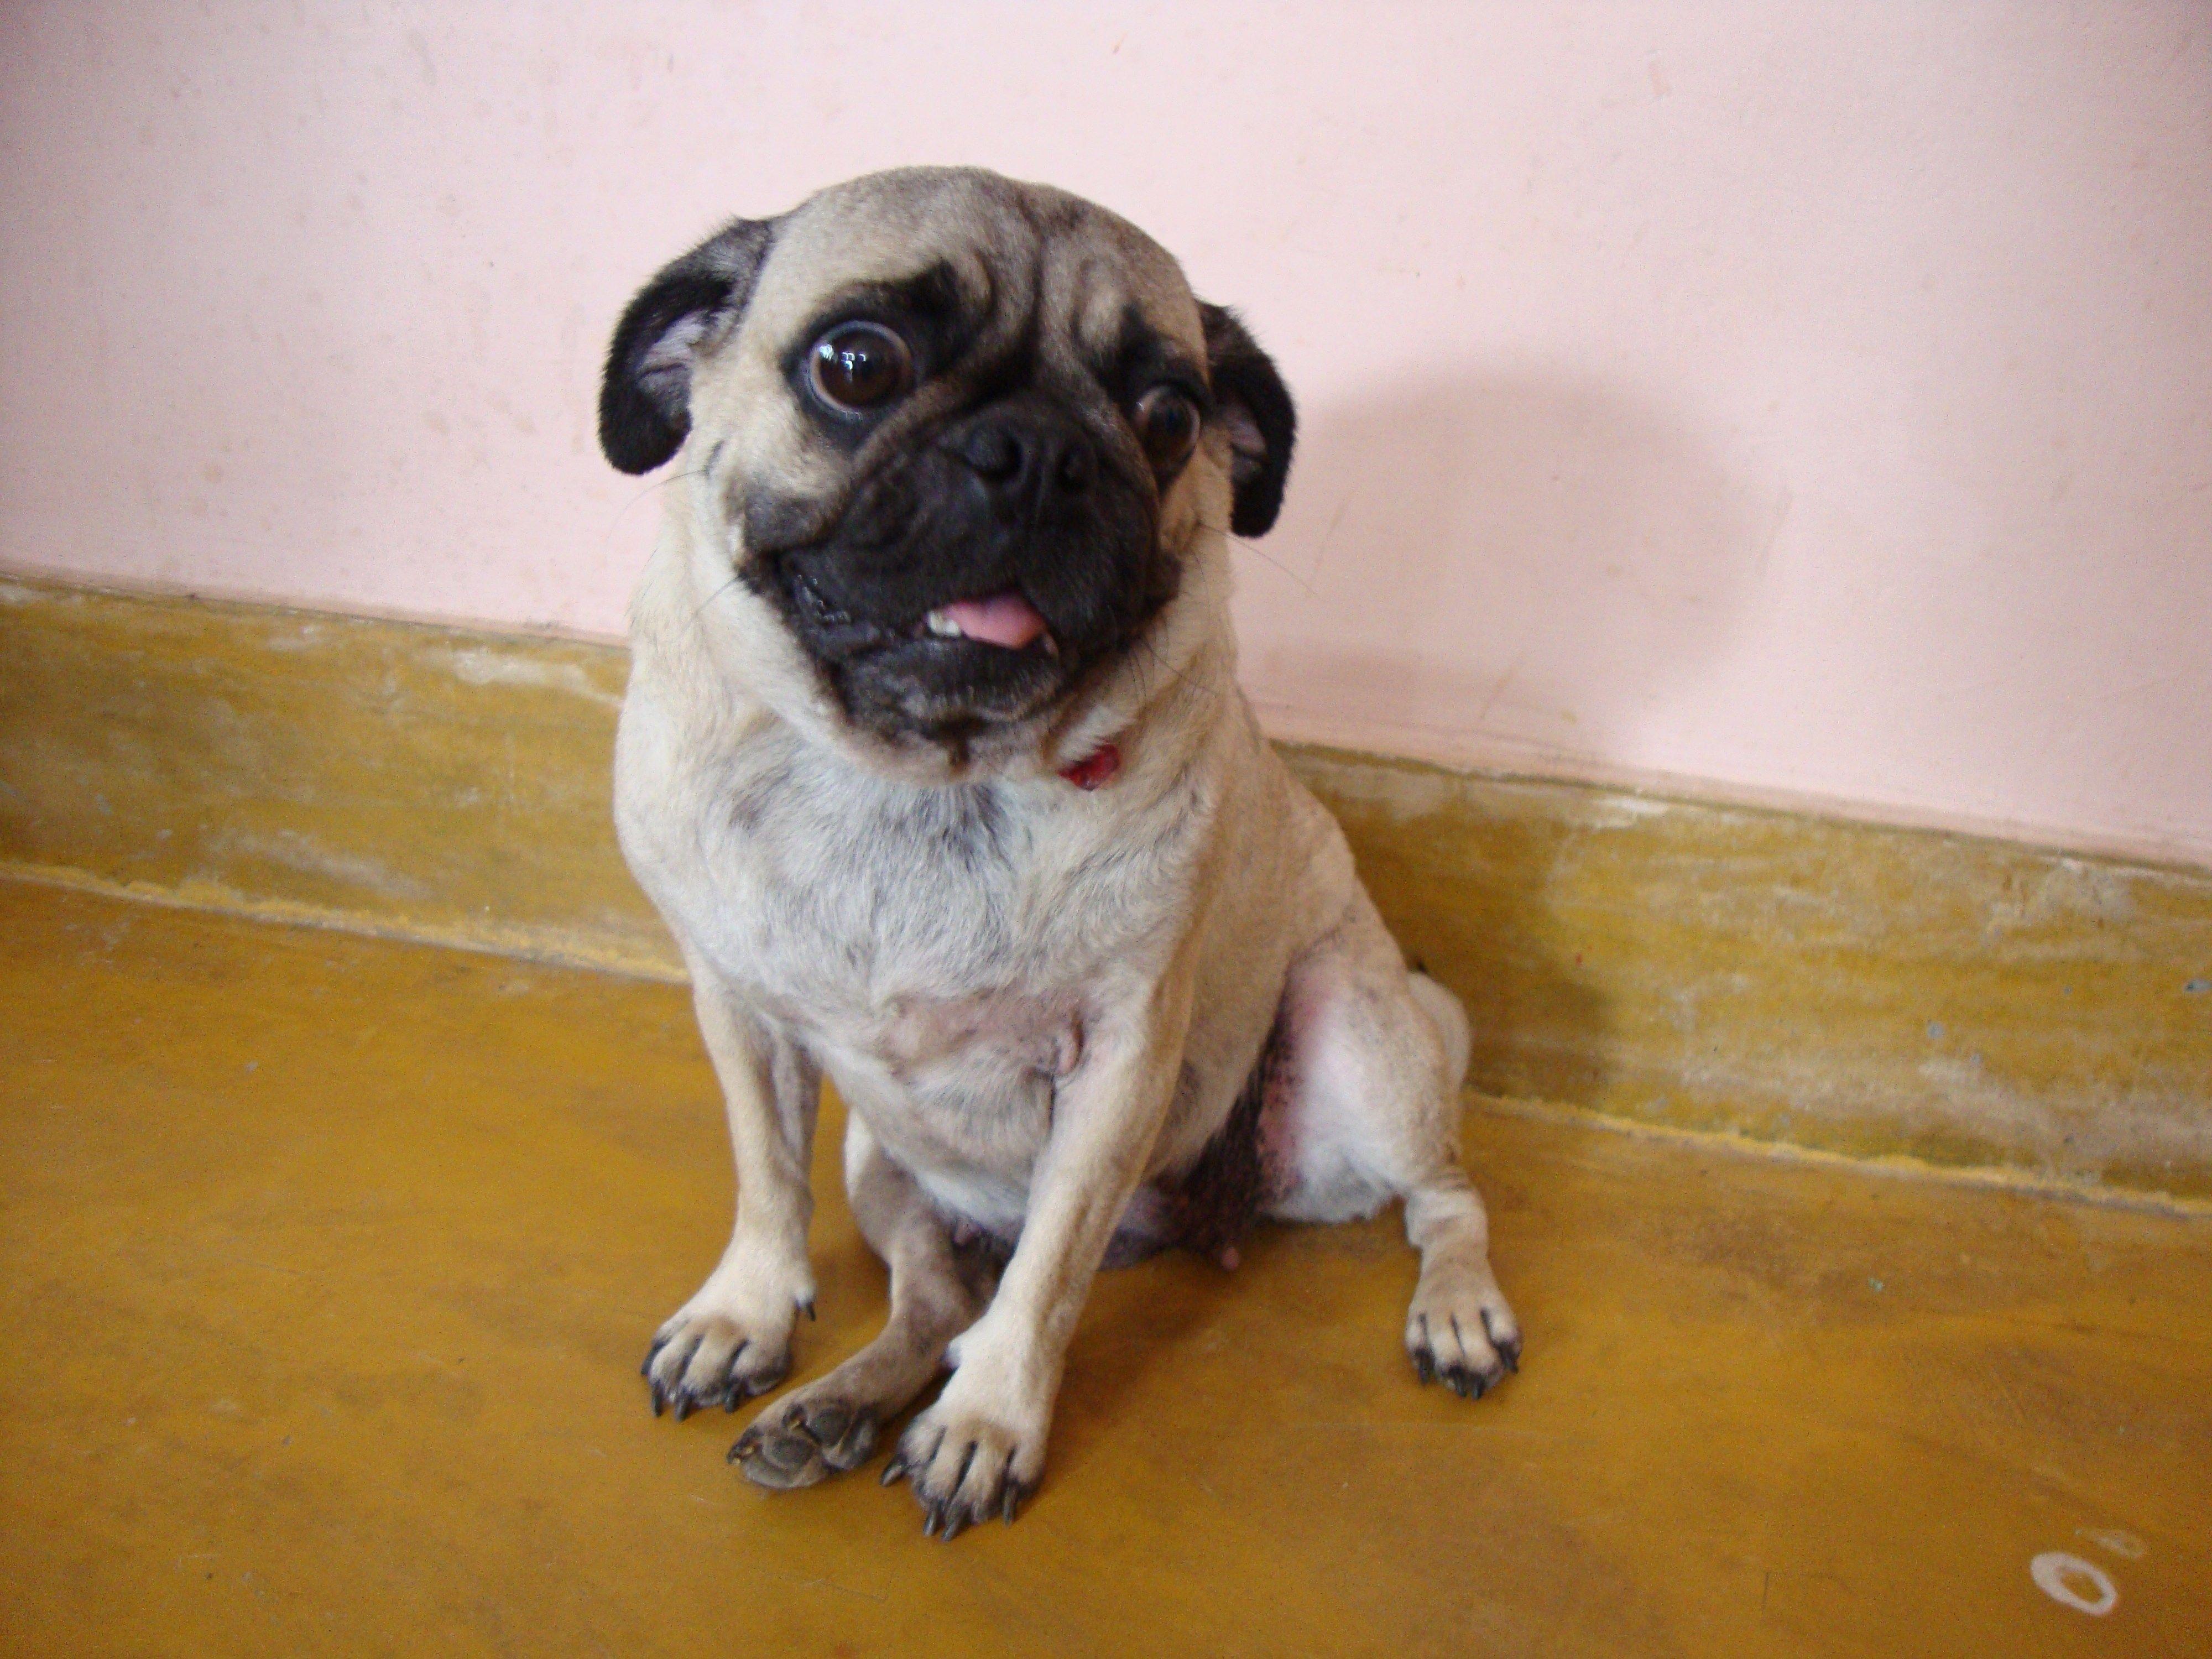 Free Download Pug Wallpapers Hd Pug Wallpaper Animals Pugs